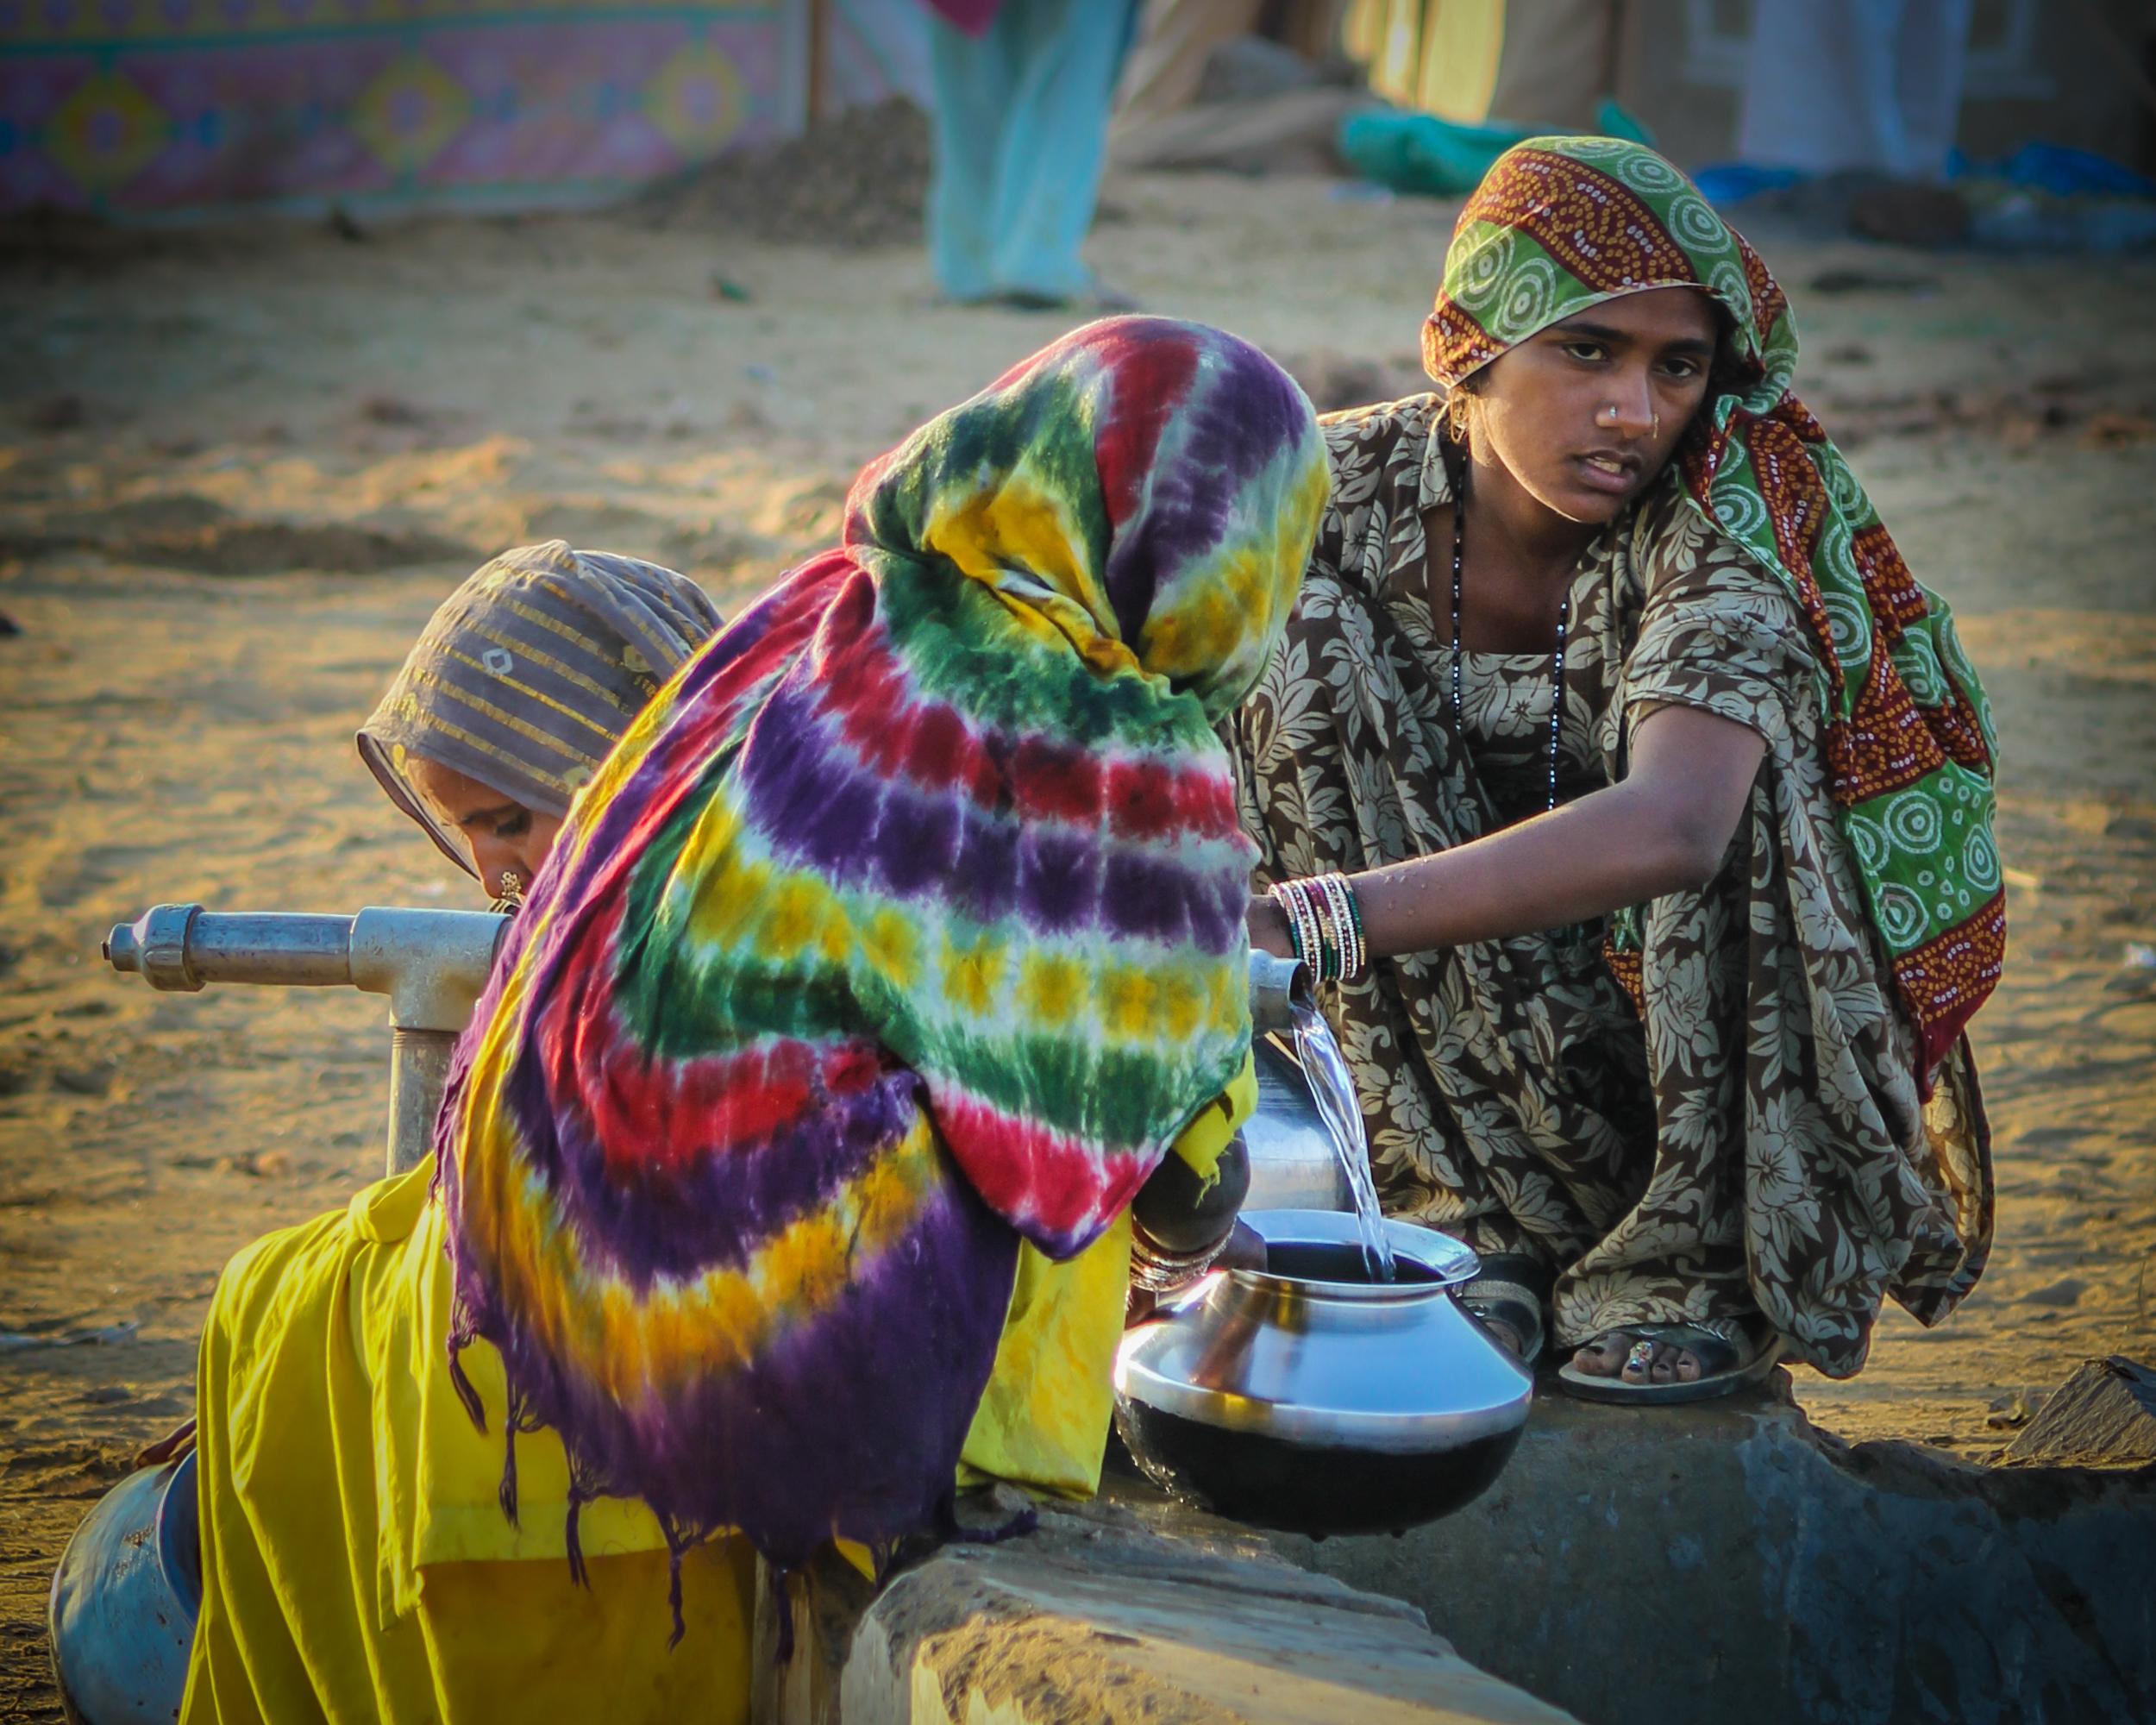 fetching water, Pushkar India